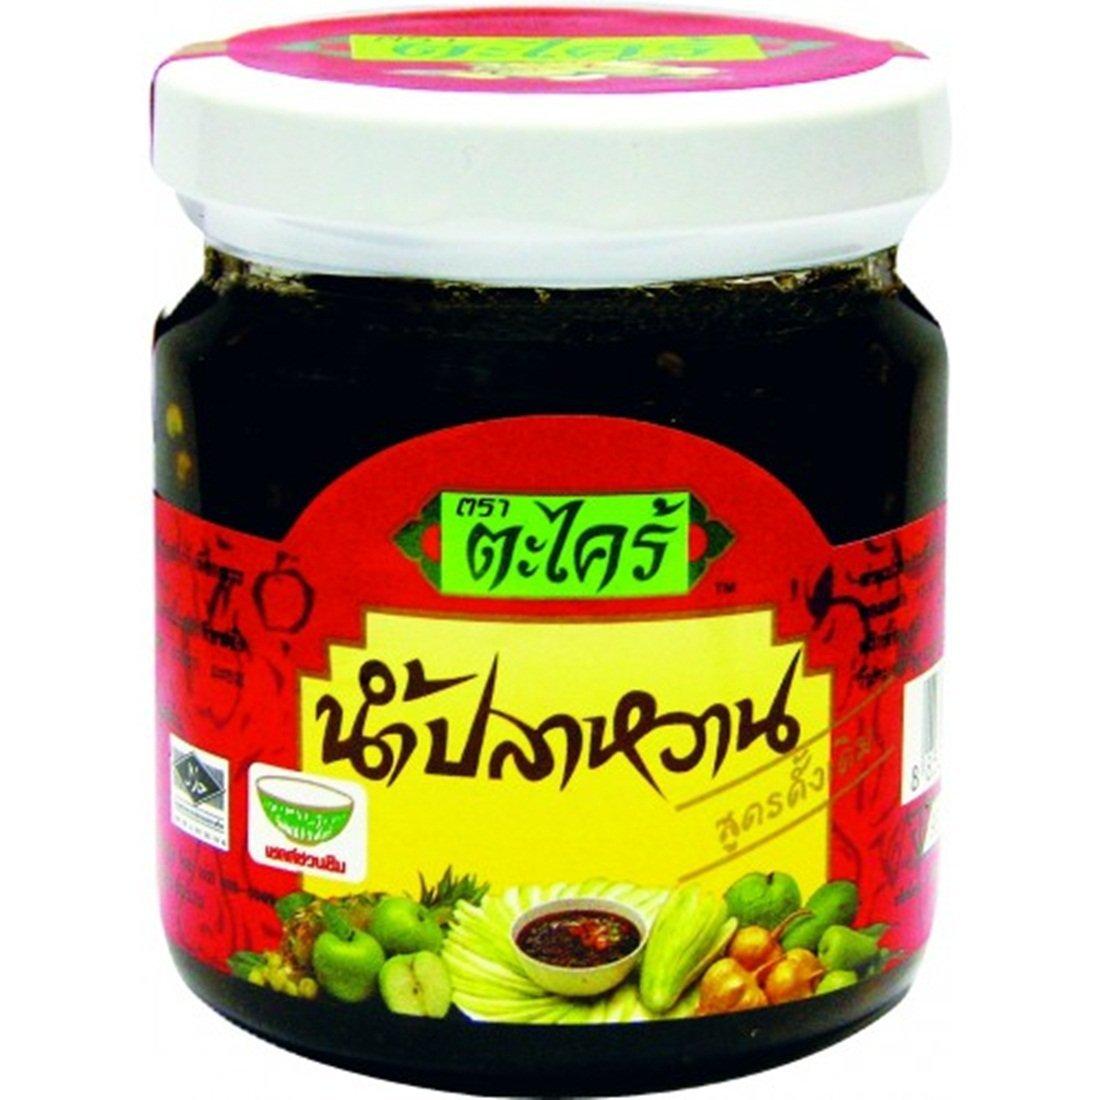 2x Dipping Sauce Nam-pla Wan Original Taste 8 Oz. (Glass Jar)